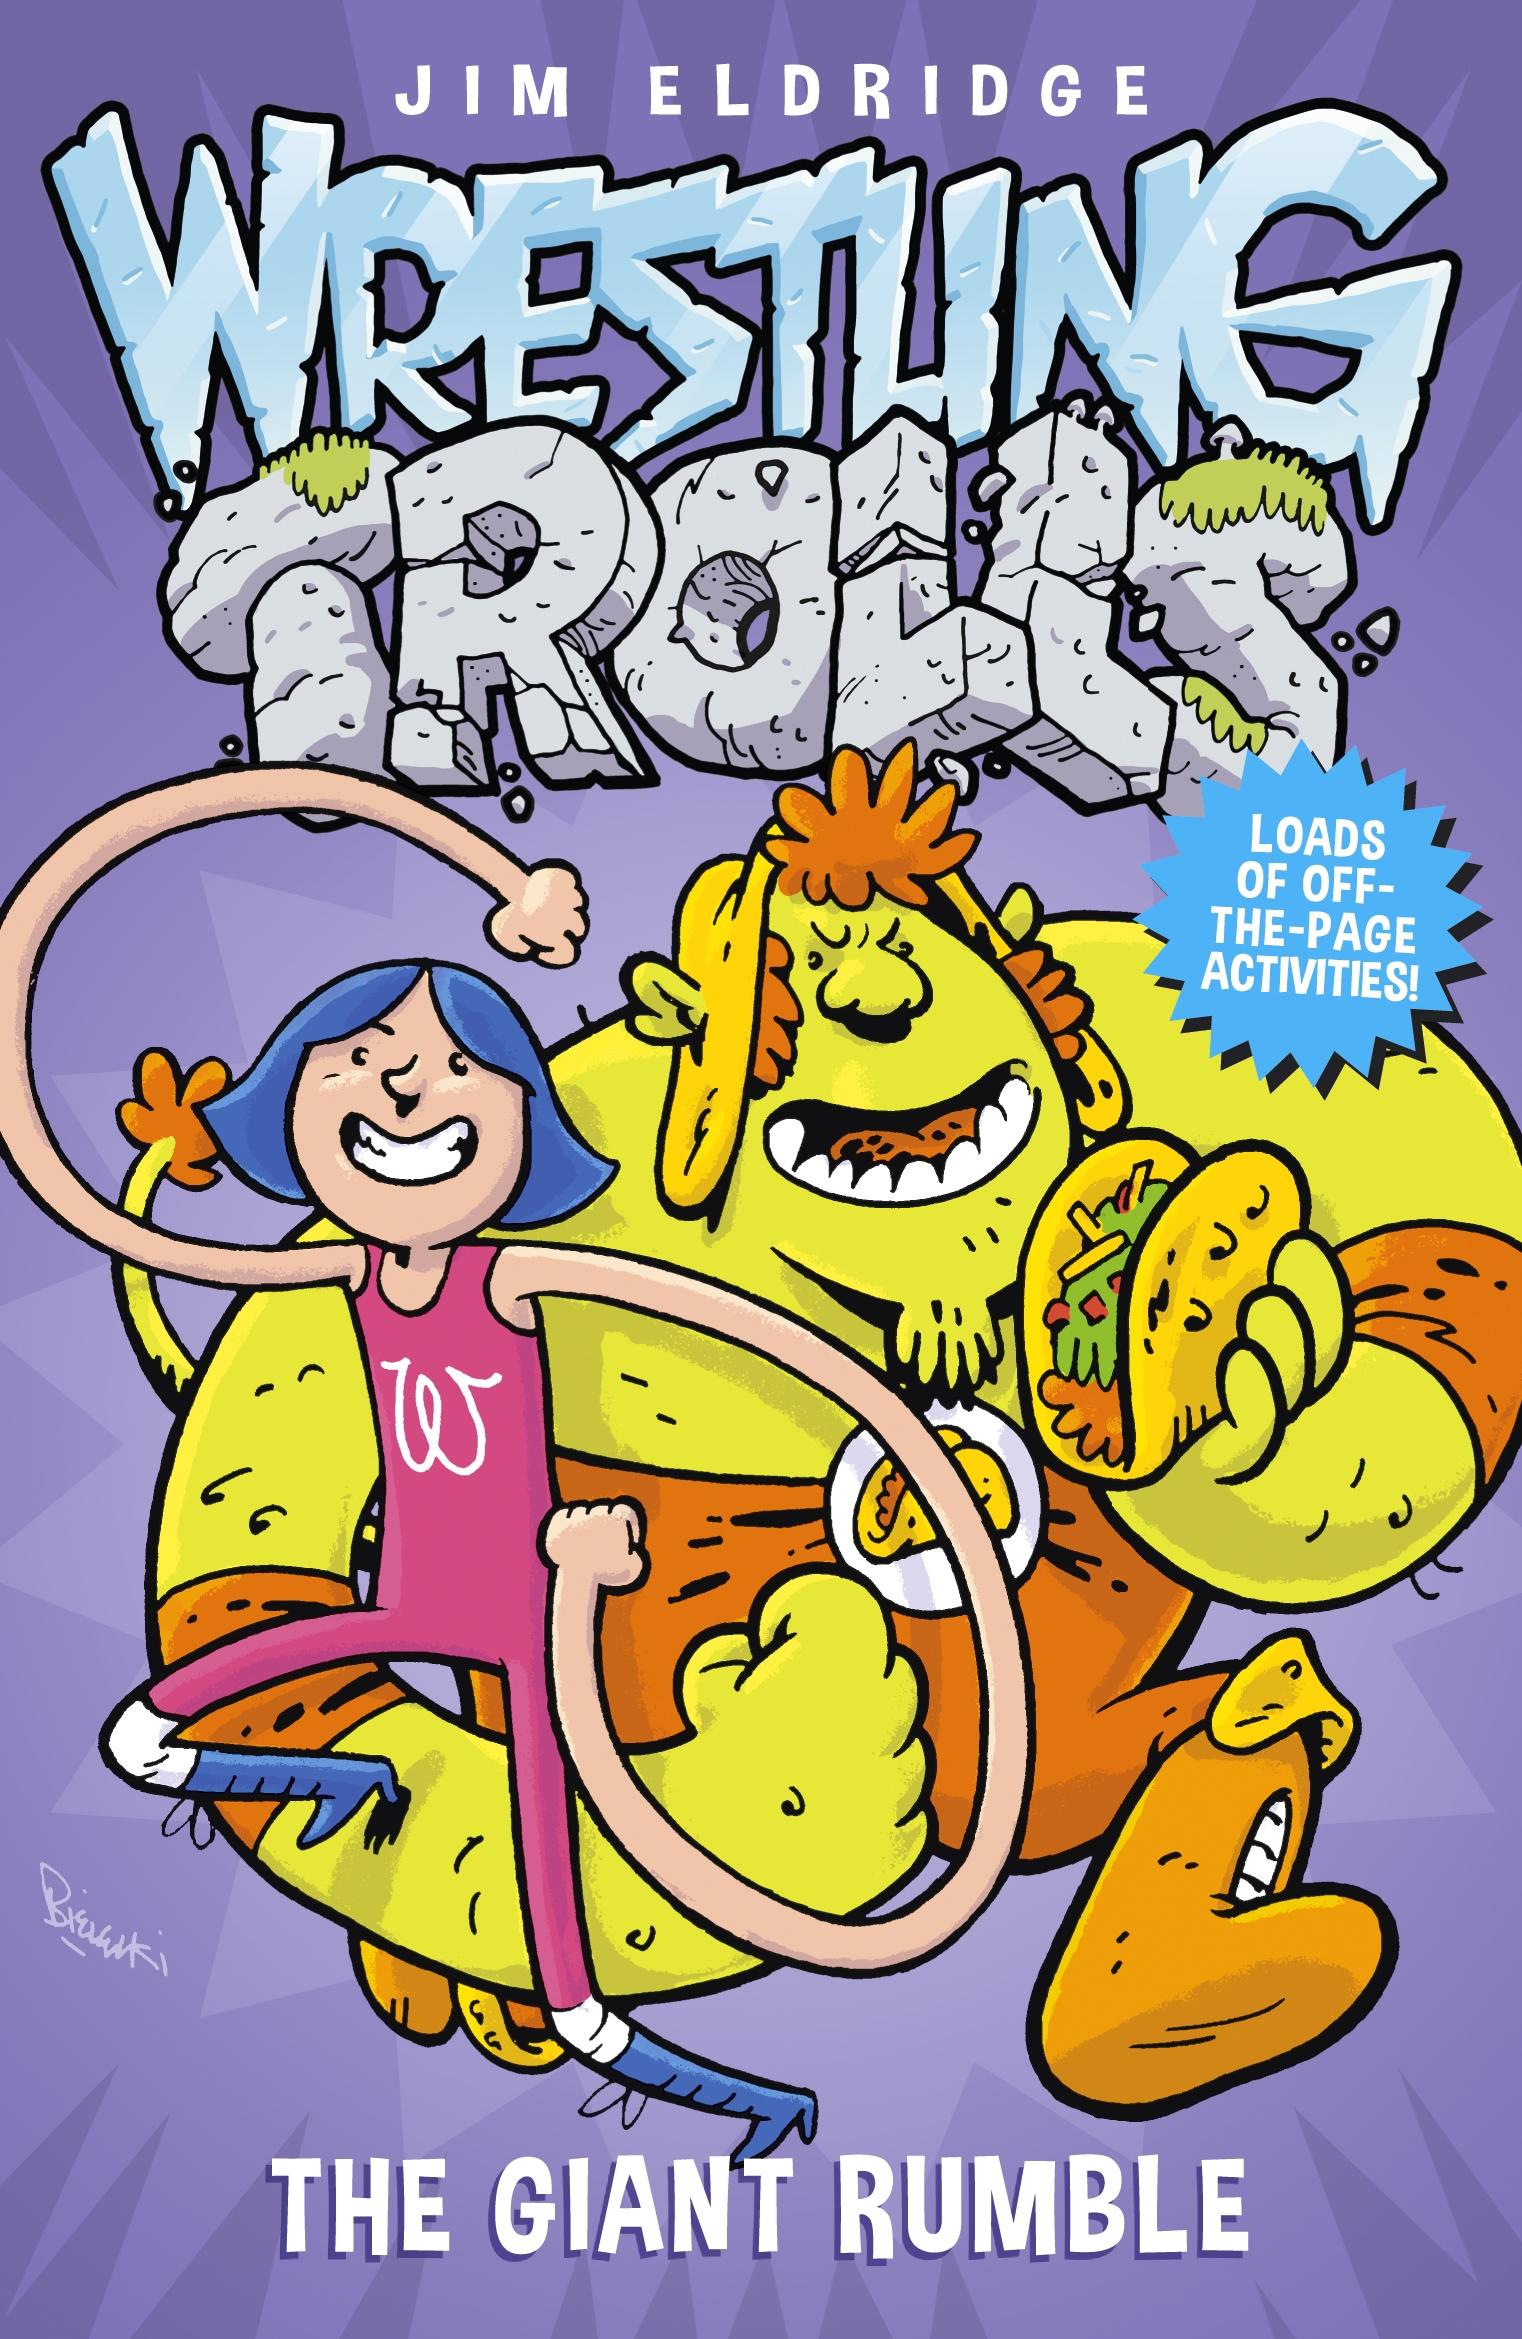 The Giant Rumble by Jim Eldridge